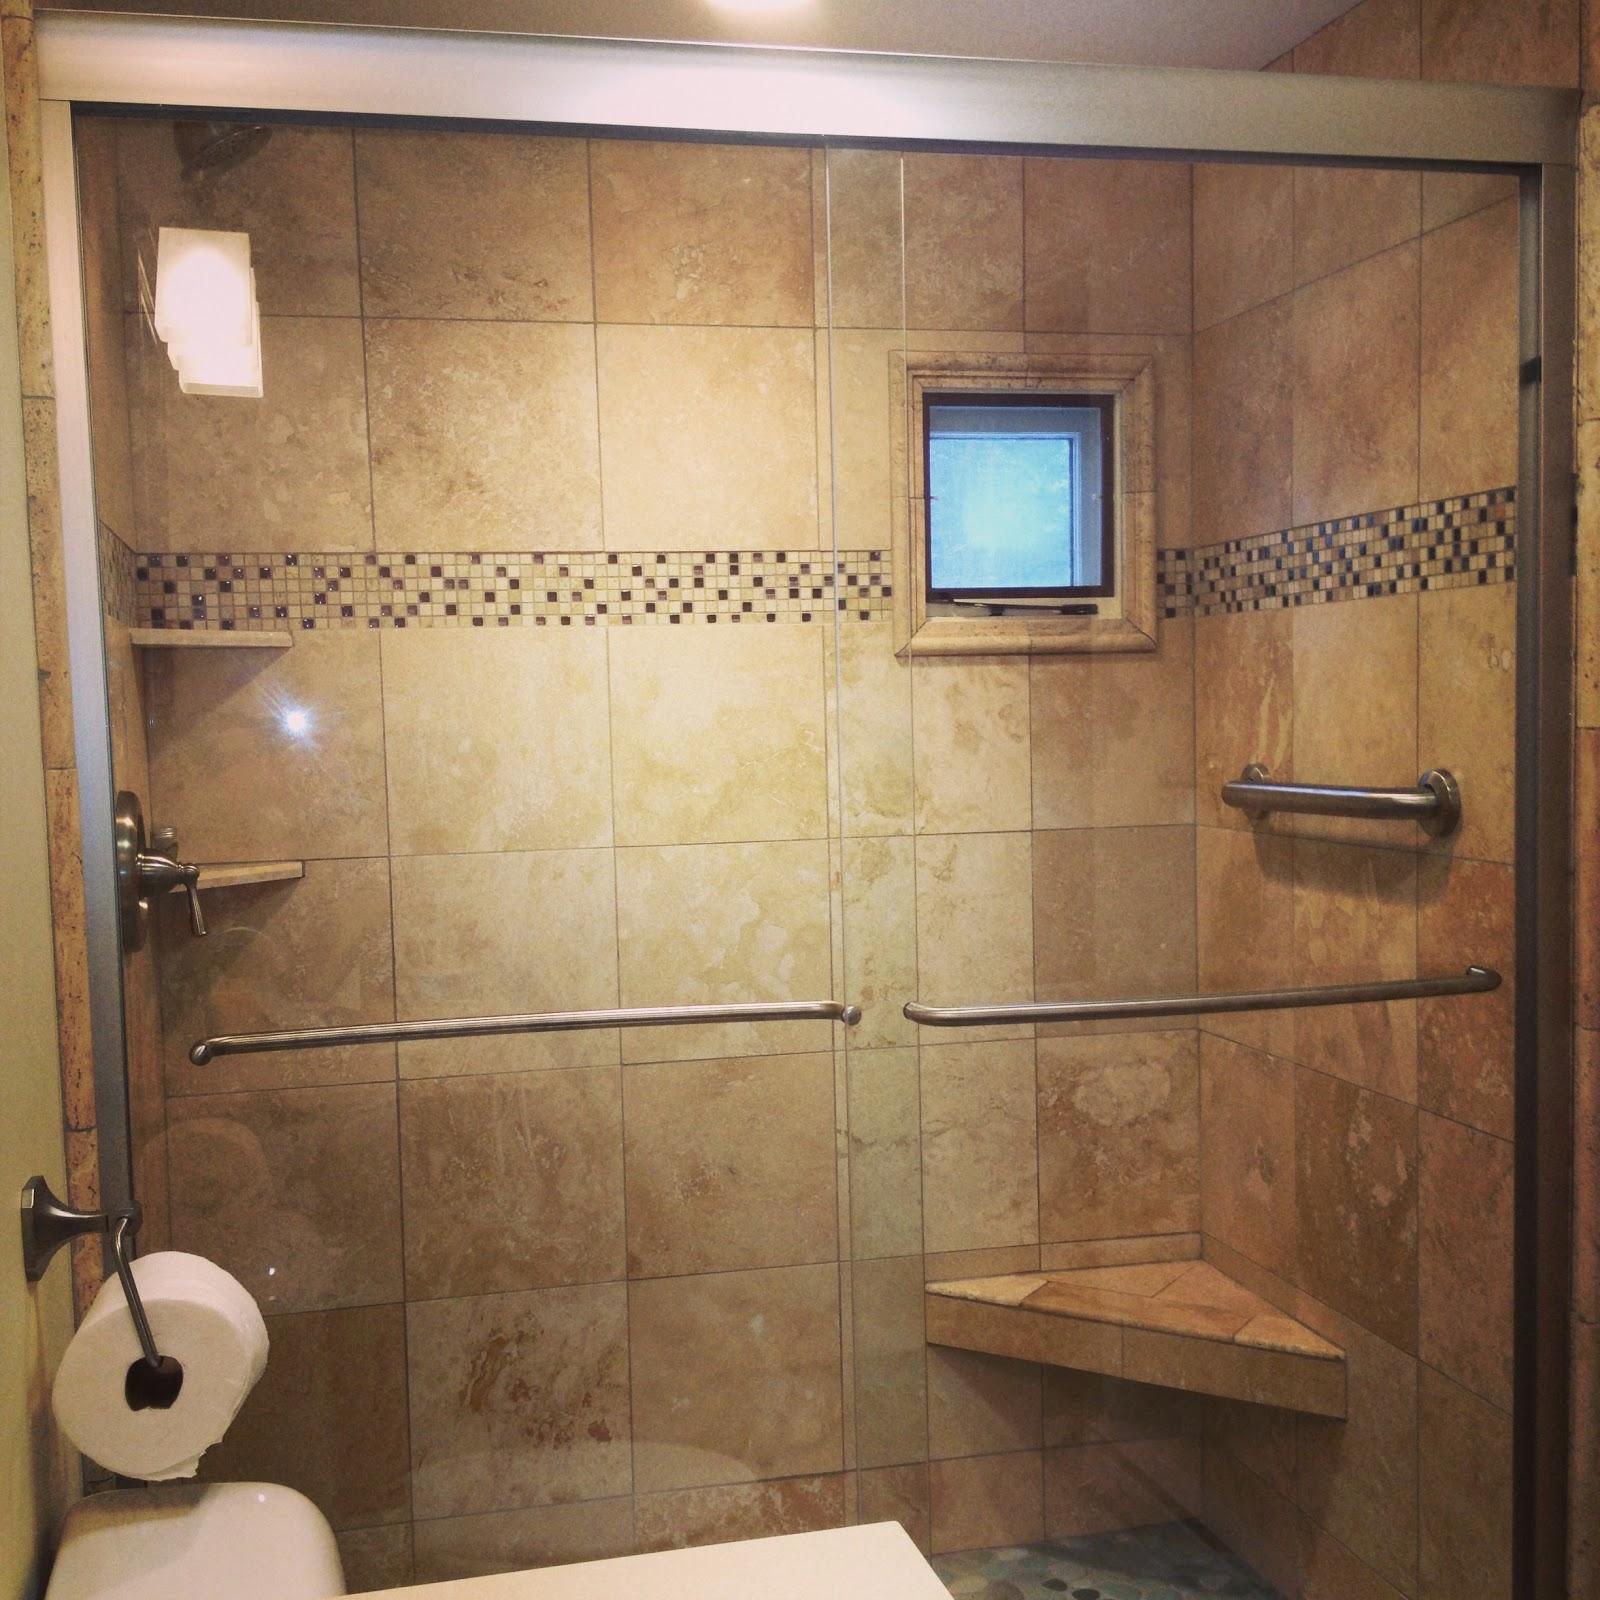 Vt Doors Amp 8lv Stile Rail Mdf Door Glass U2013 Vt